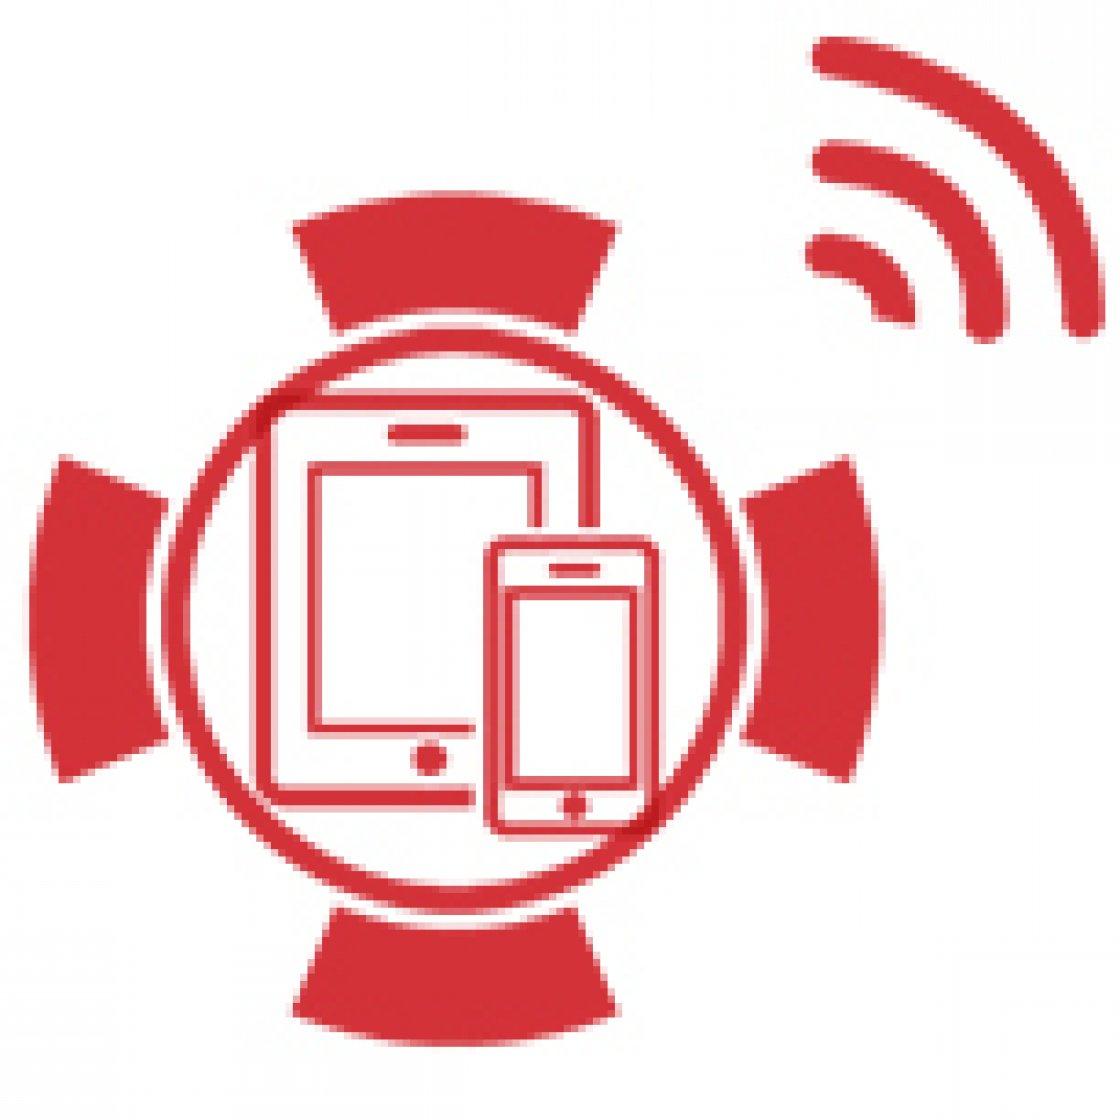 Control via Smartphone or Tablet